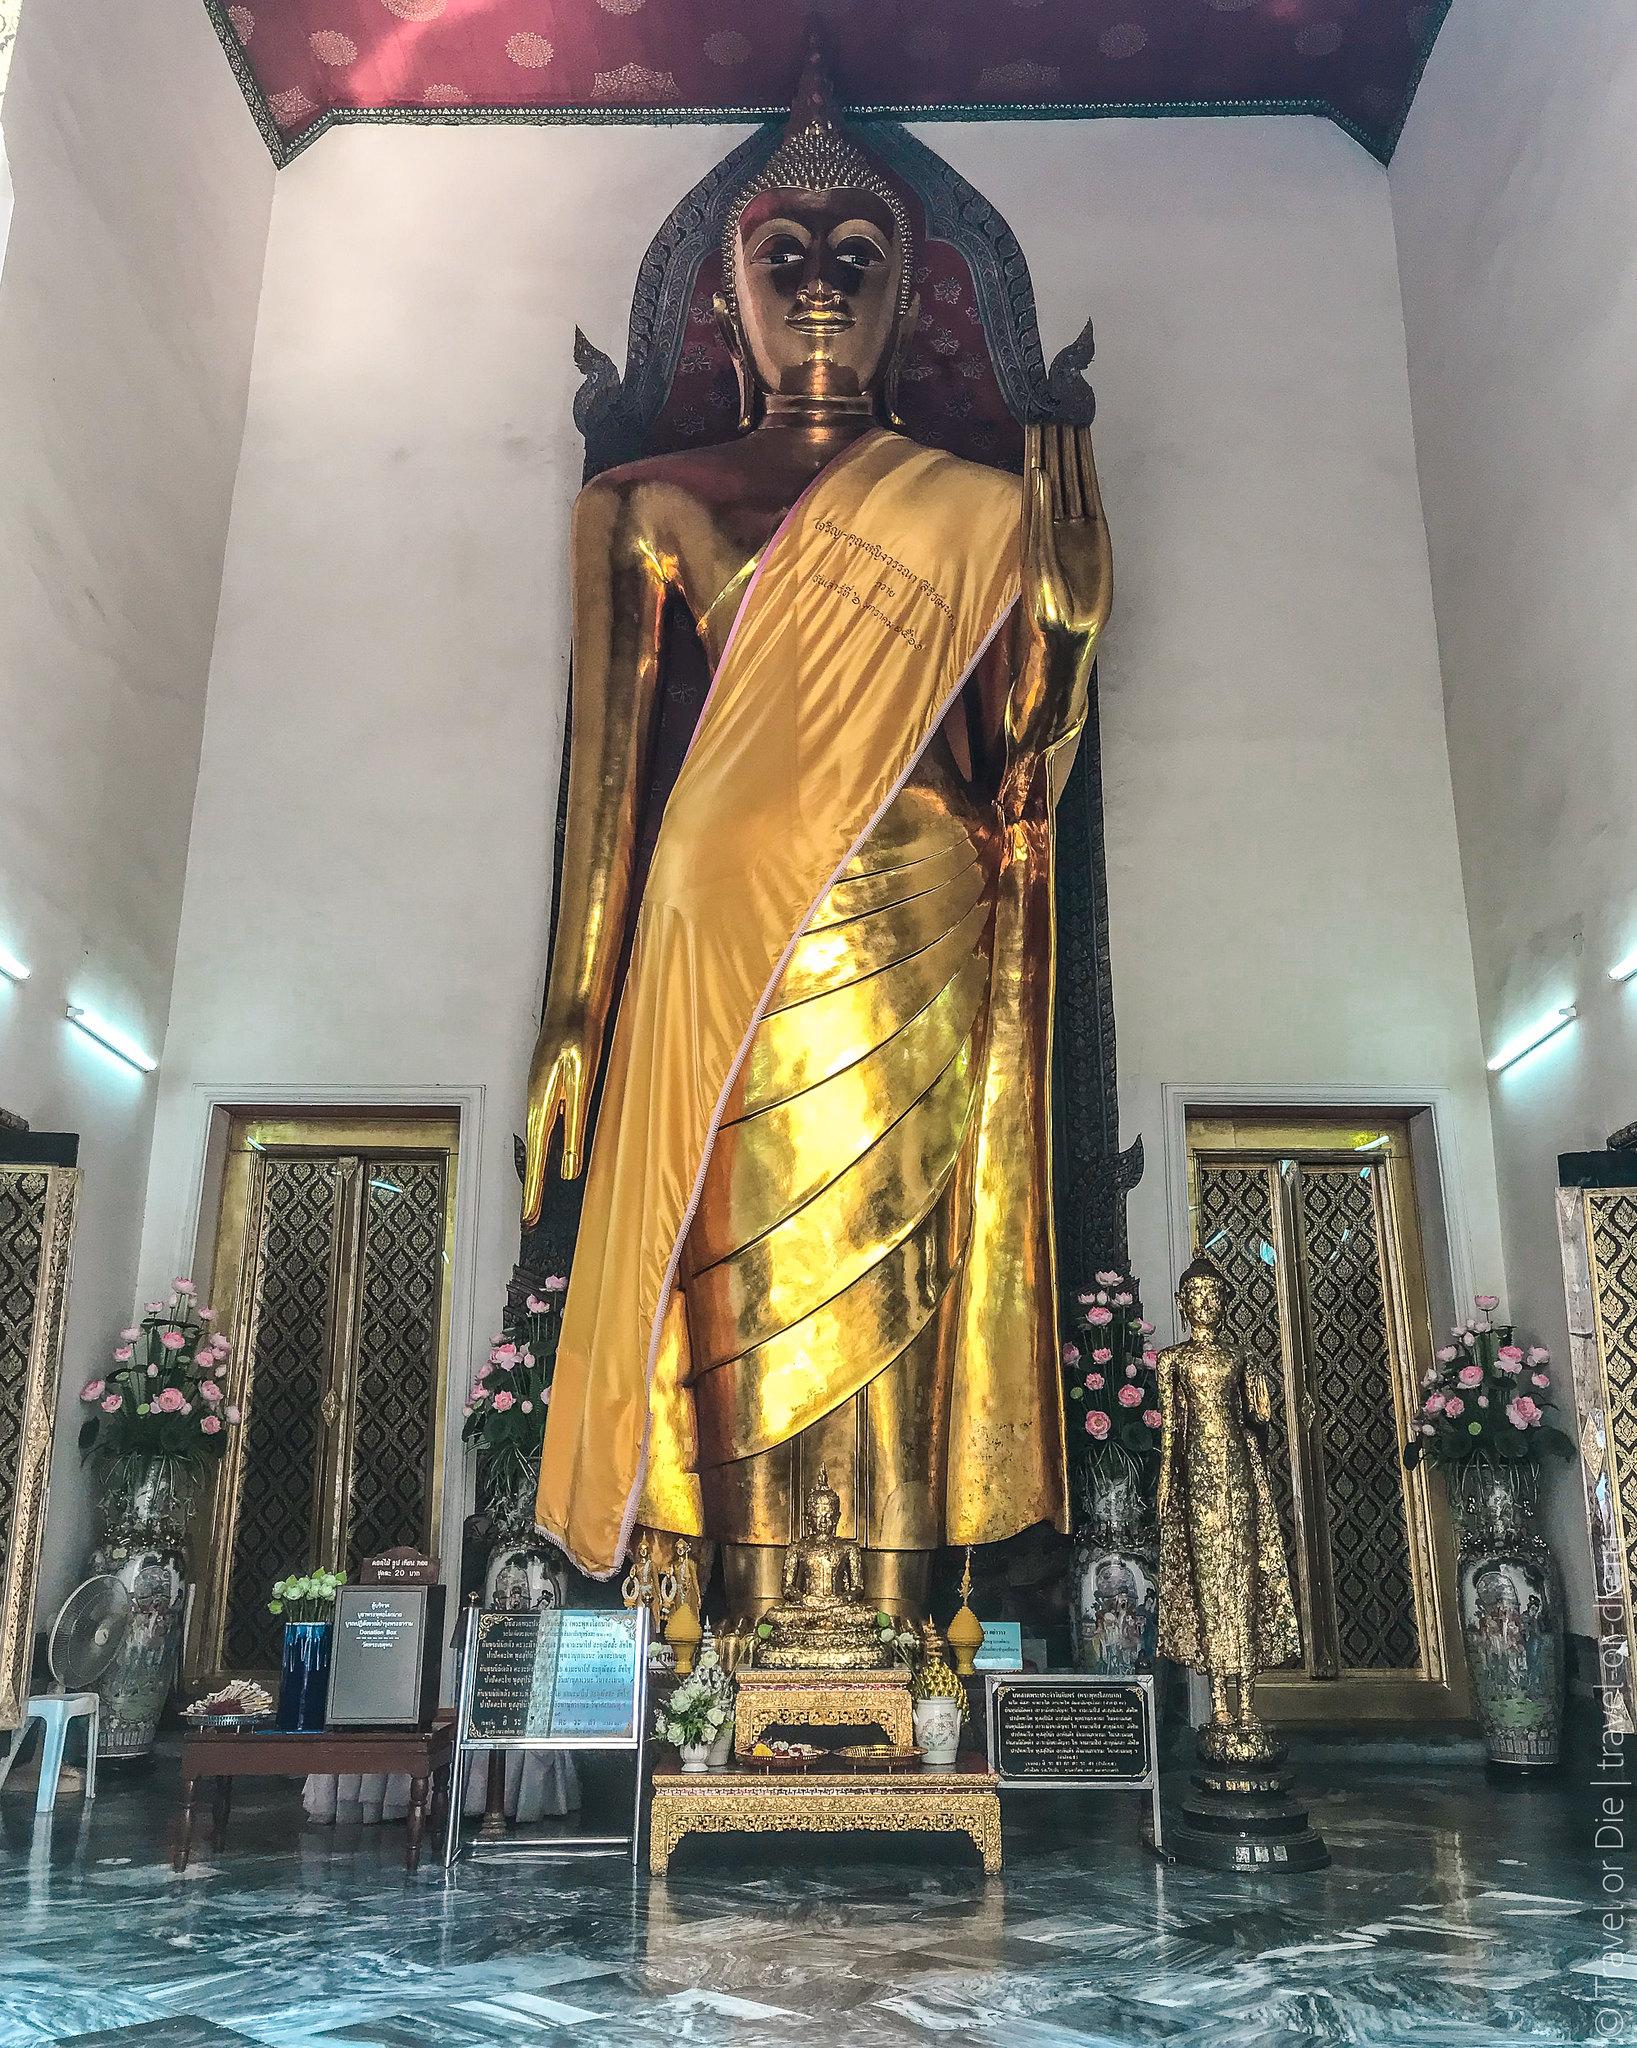 Wat-Pho-Bangkok-Храм-Лежащего-Будды-9156